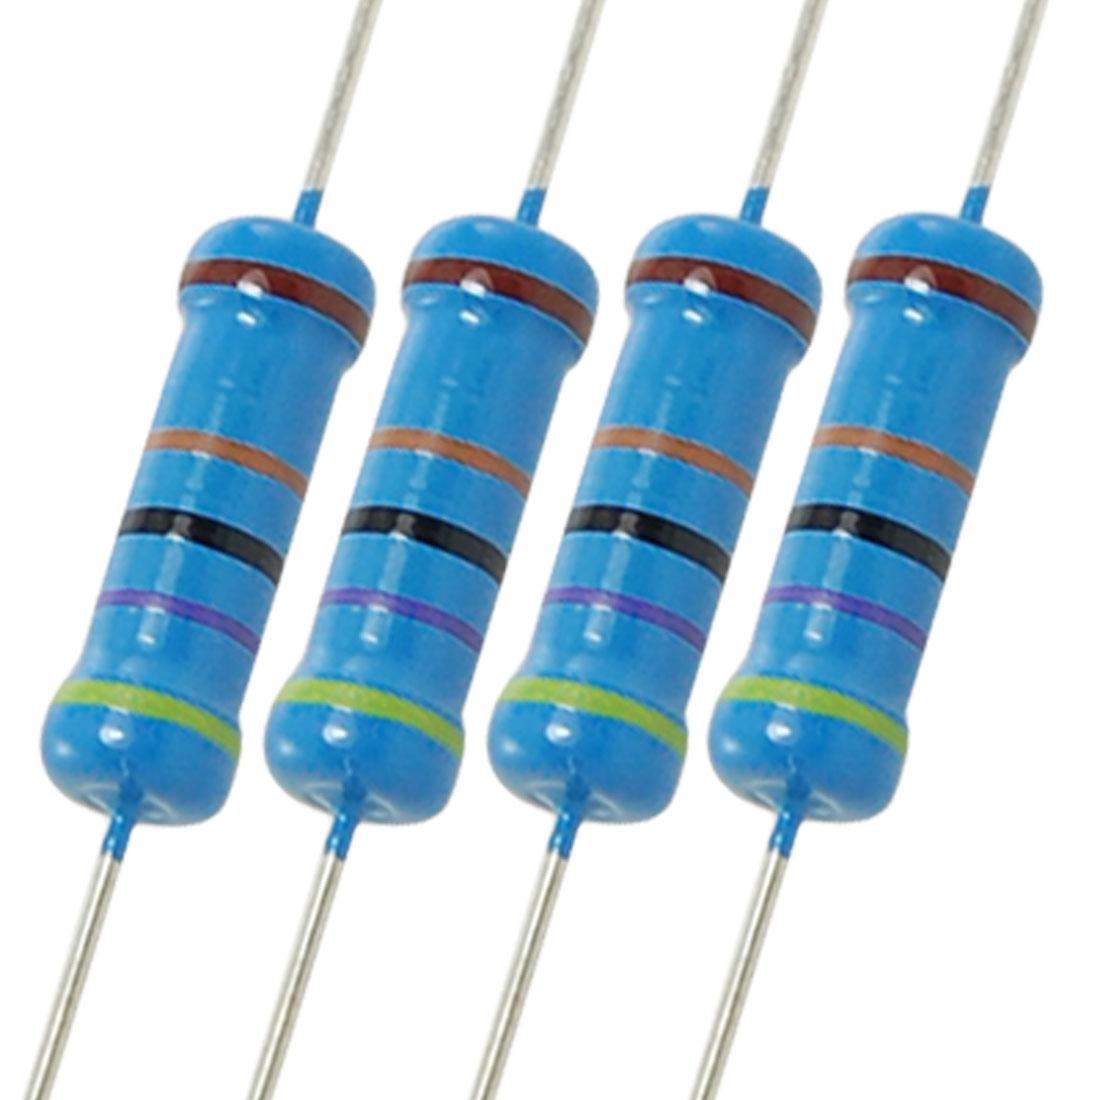 2W 470K Ohm 1% Axial Lead Metal Film Resistors 200 Pcs